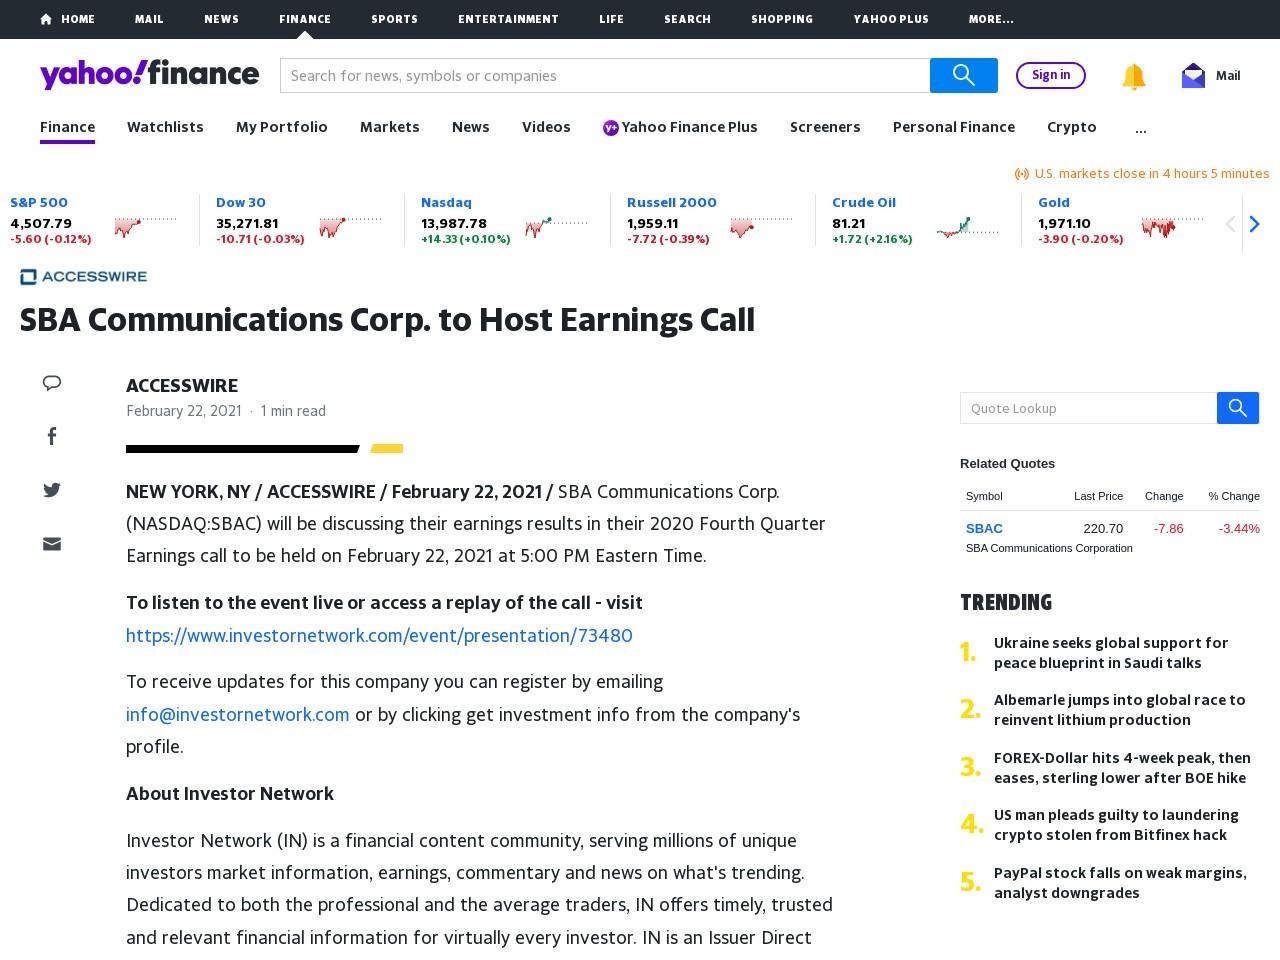 SBA Communications Corp. to Host Earnings Call – Yahoo Finance